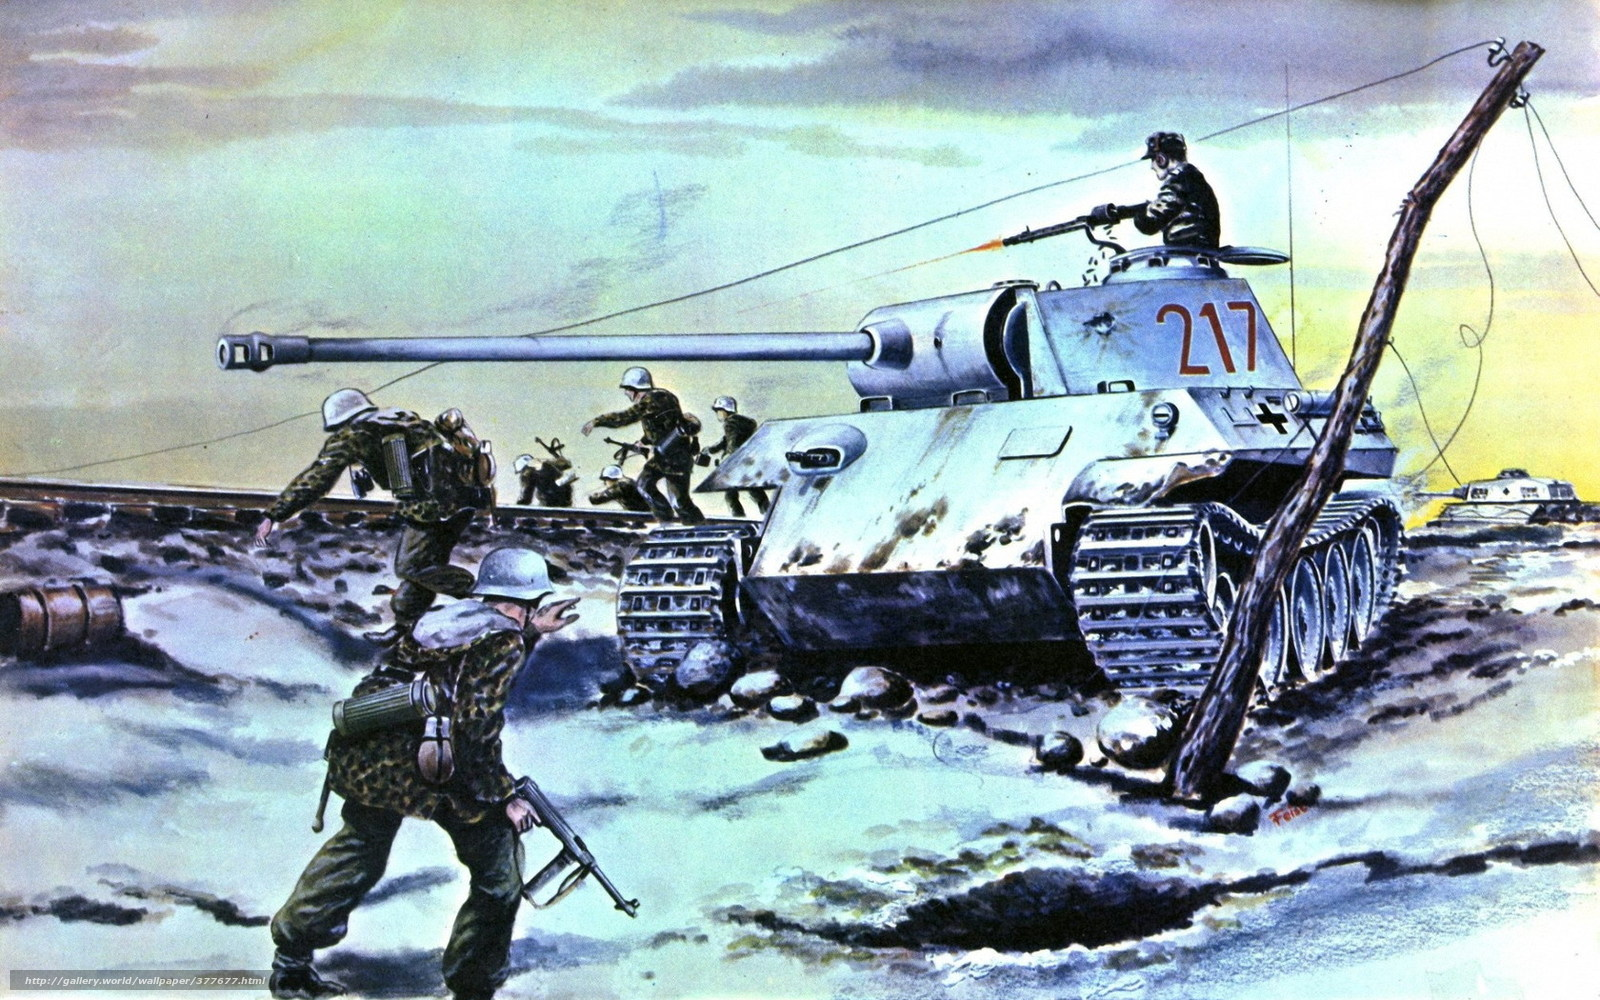 panther tank wallpaper hd - photo #11